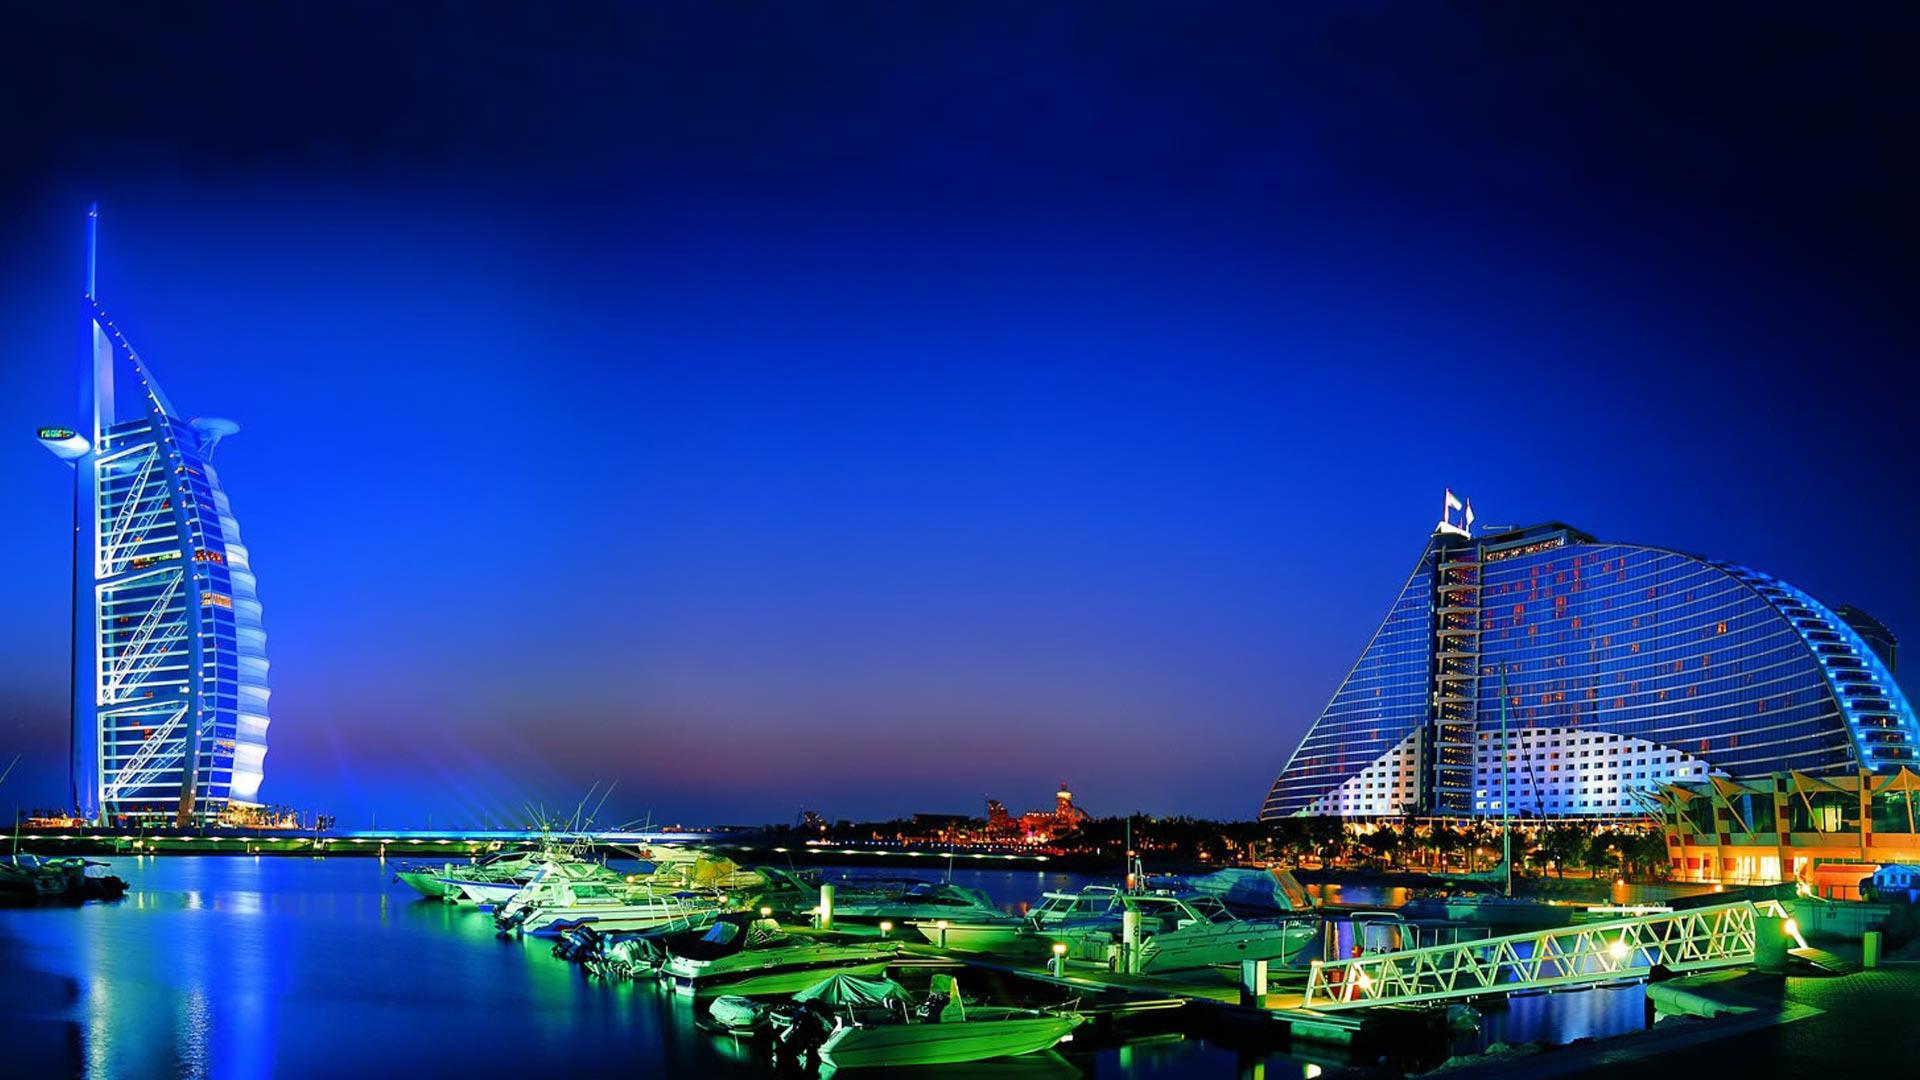 extravagantne-arabske-mesto (14)